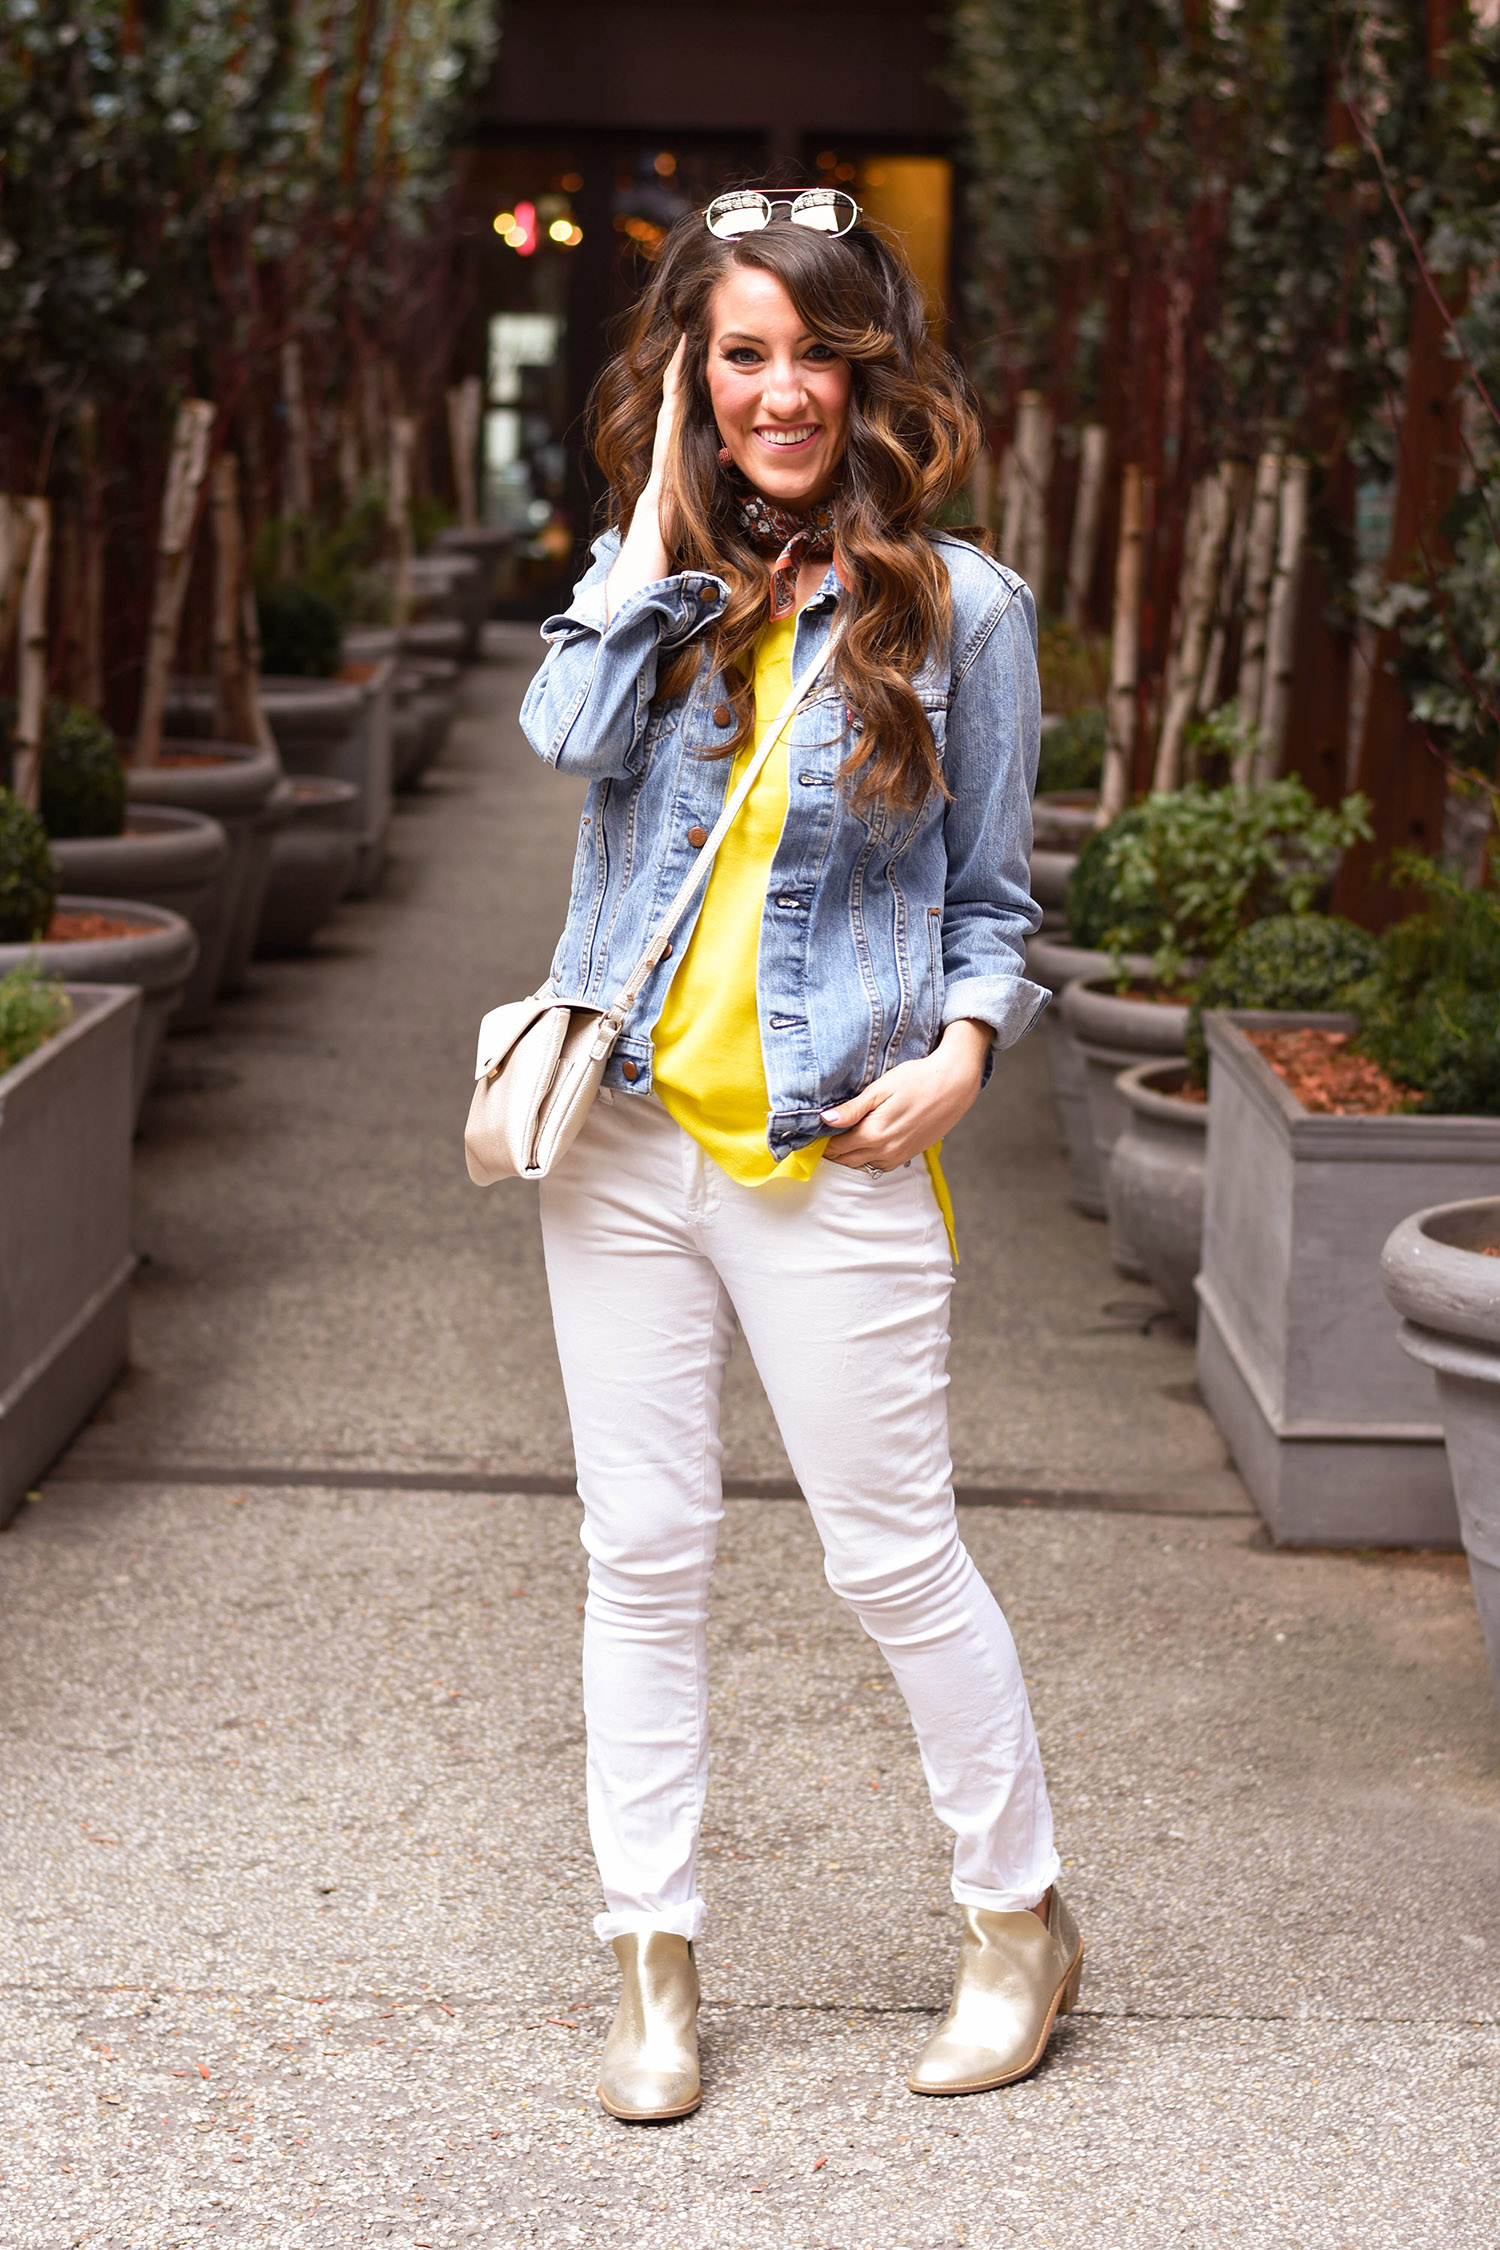 Anthropologie  sweater  // jeans [ similar  /  Levi's ]//  crossbody  //  sunnies  //  Levi's jacket  // Madewell earrings  // scarf [ similar ] //  Kelsi Dagger Brooklyn booties